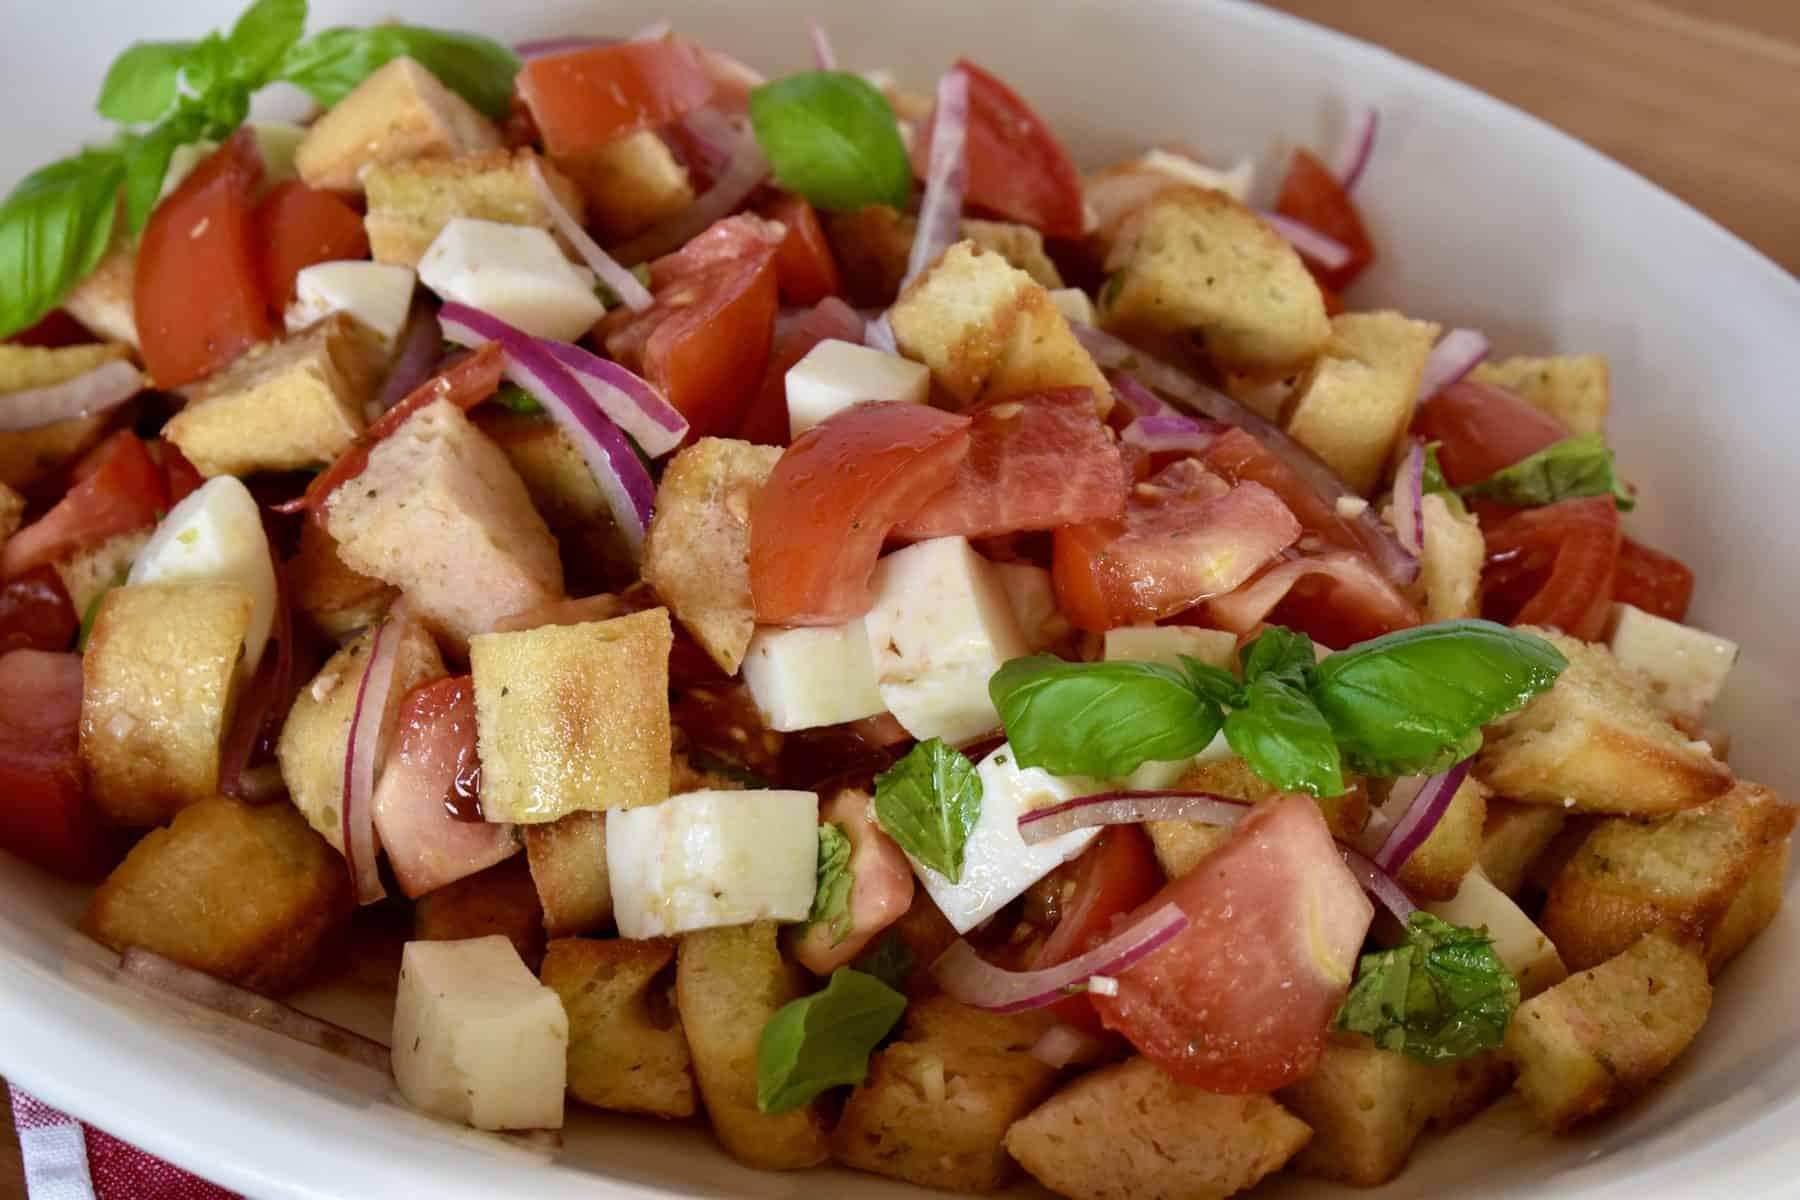 Bruschetta Salad in a large oval platter.